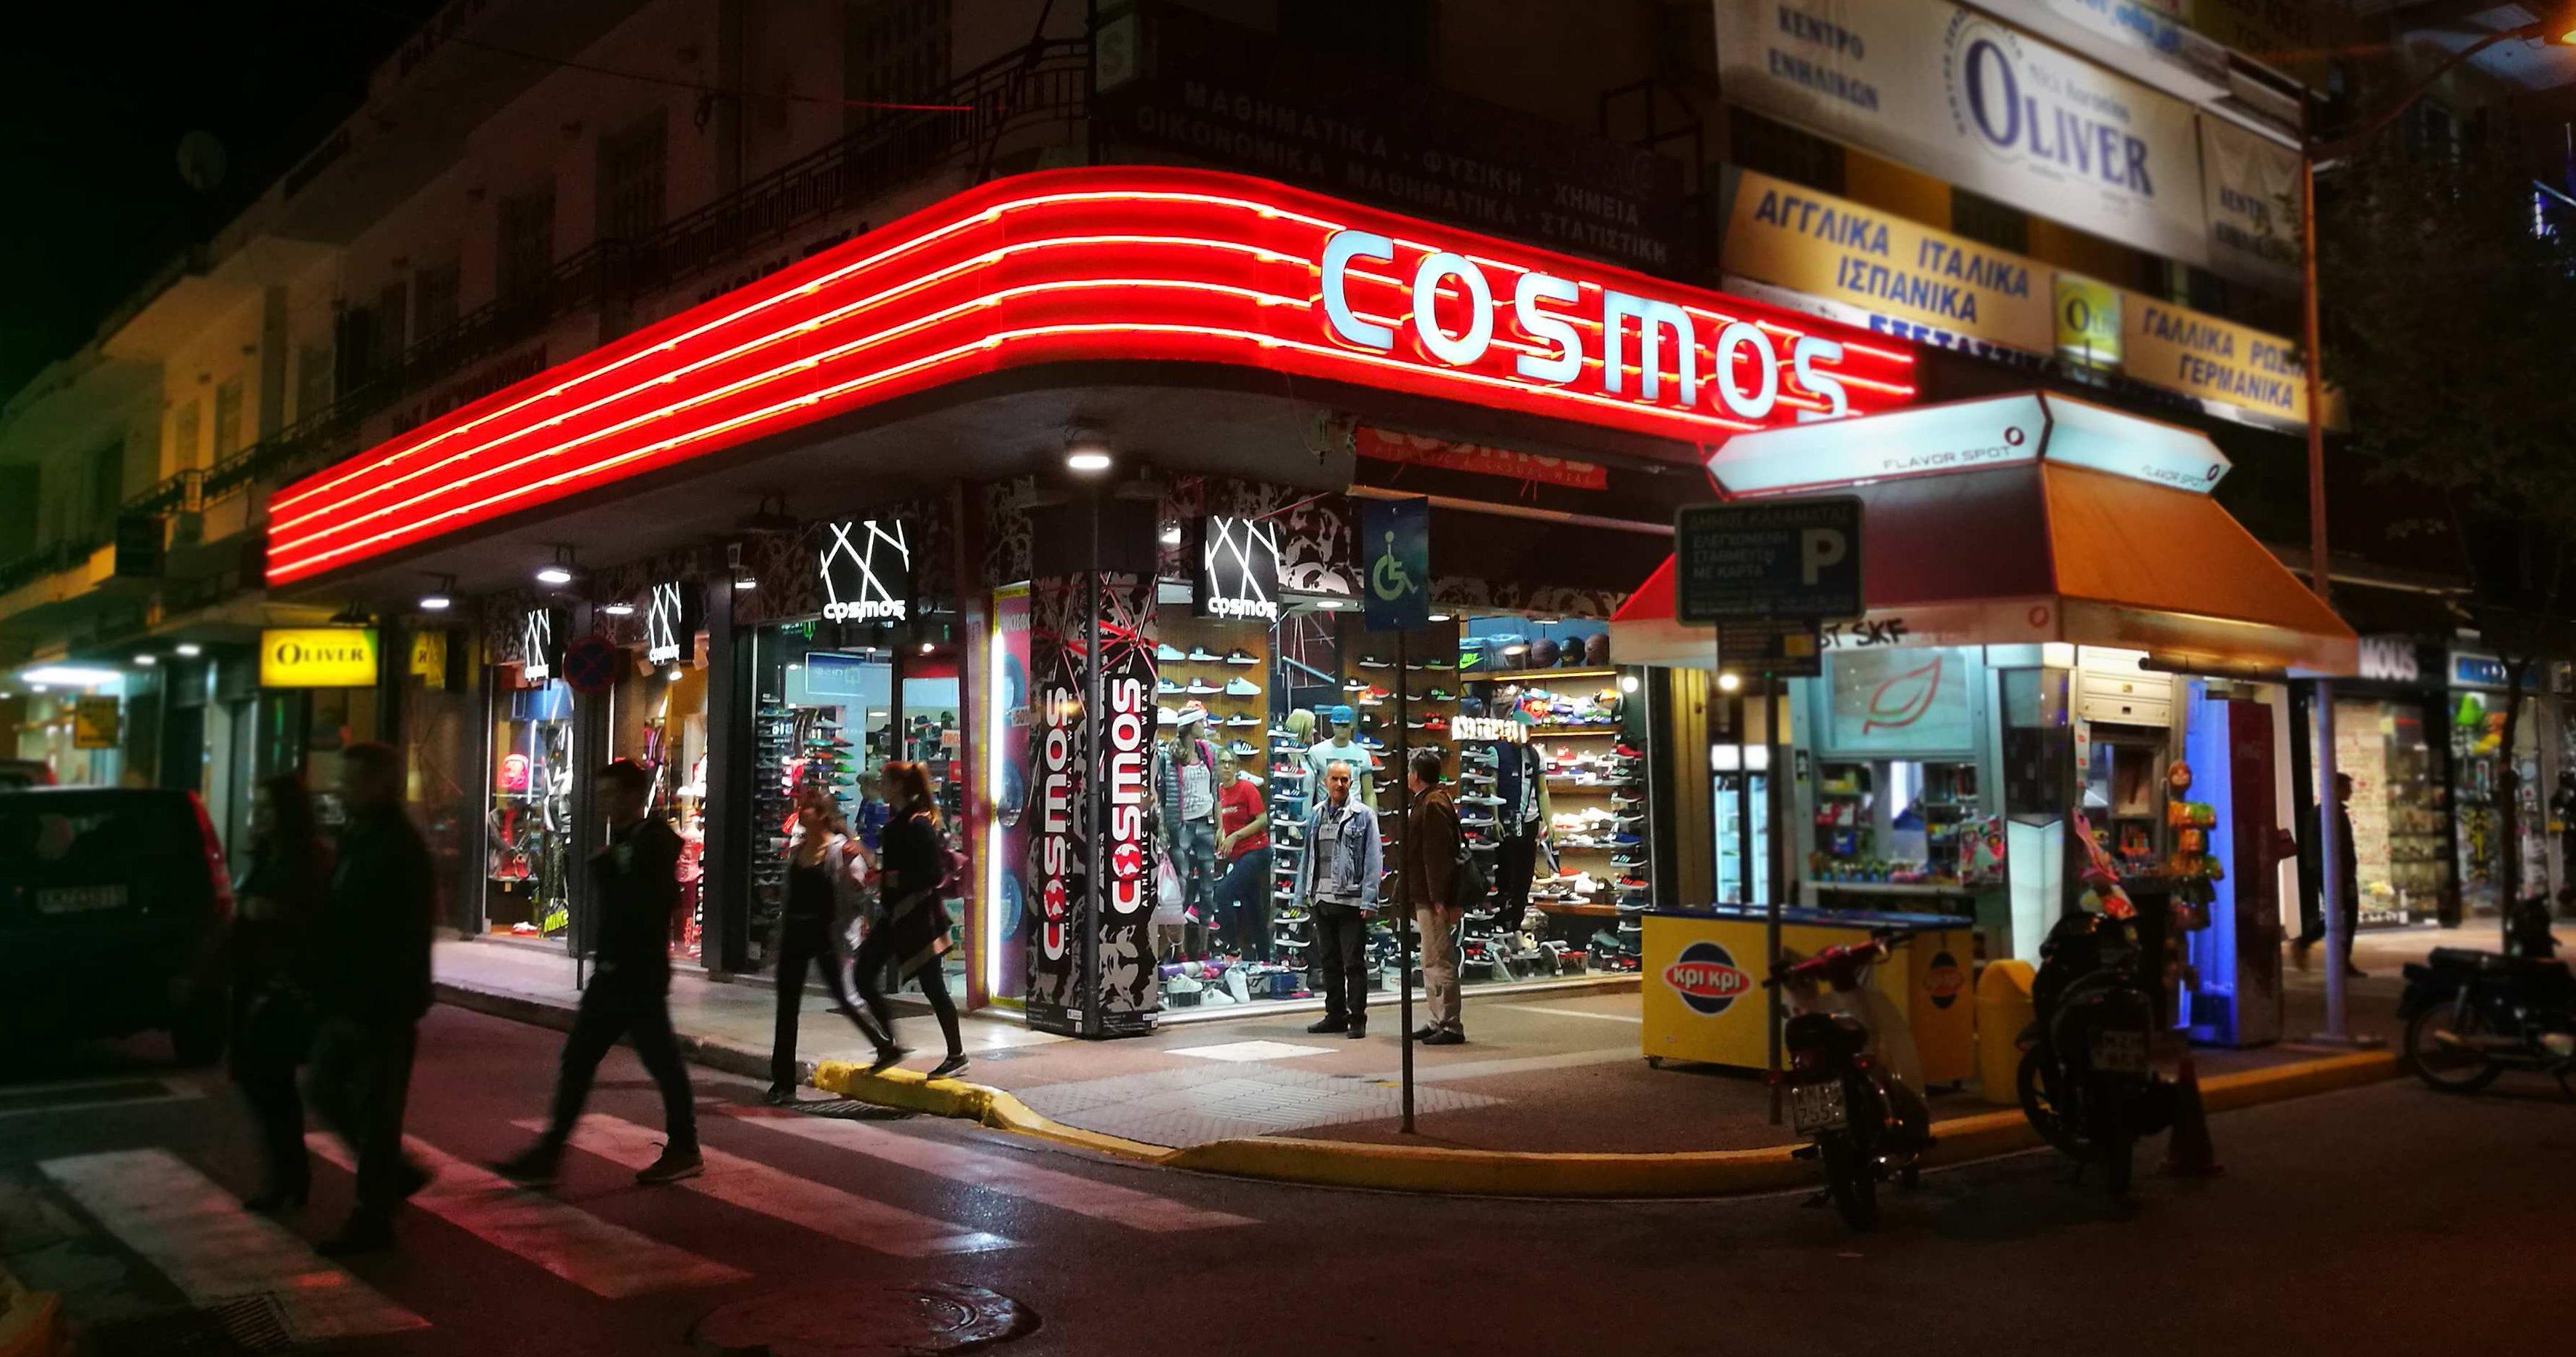 847466a8205 COSMOS Αριστομένους 39: 27 χρόνια παρέχει τα κορυφαία επώνυμα brands ...